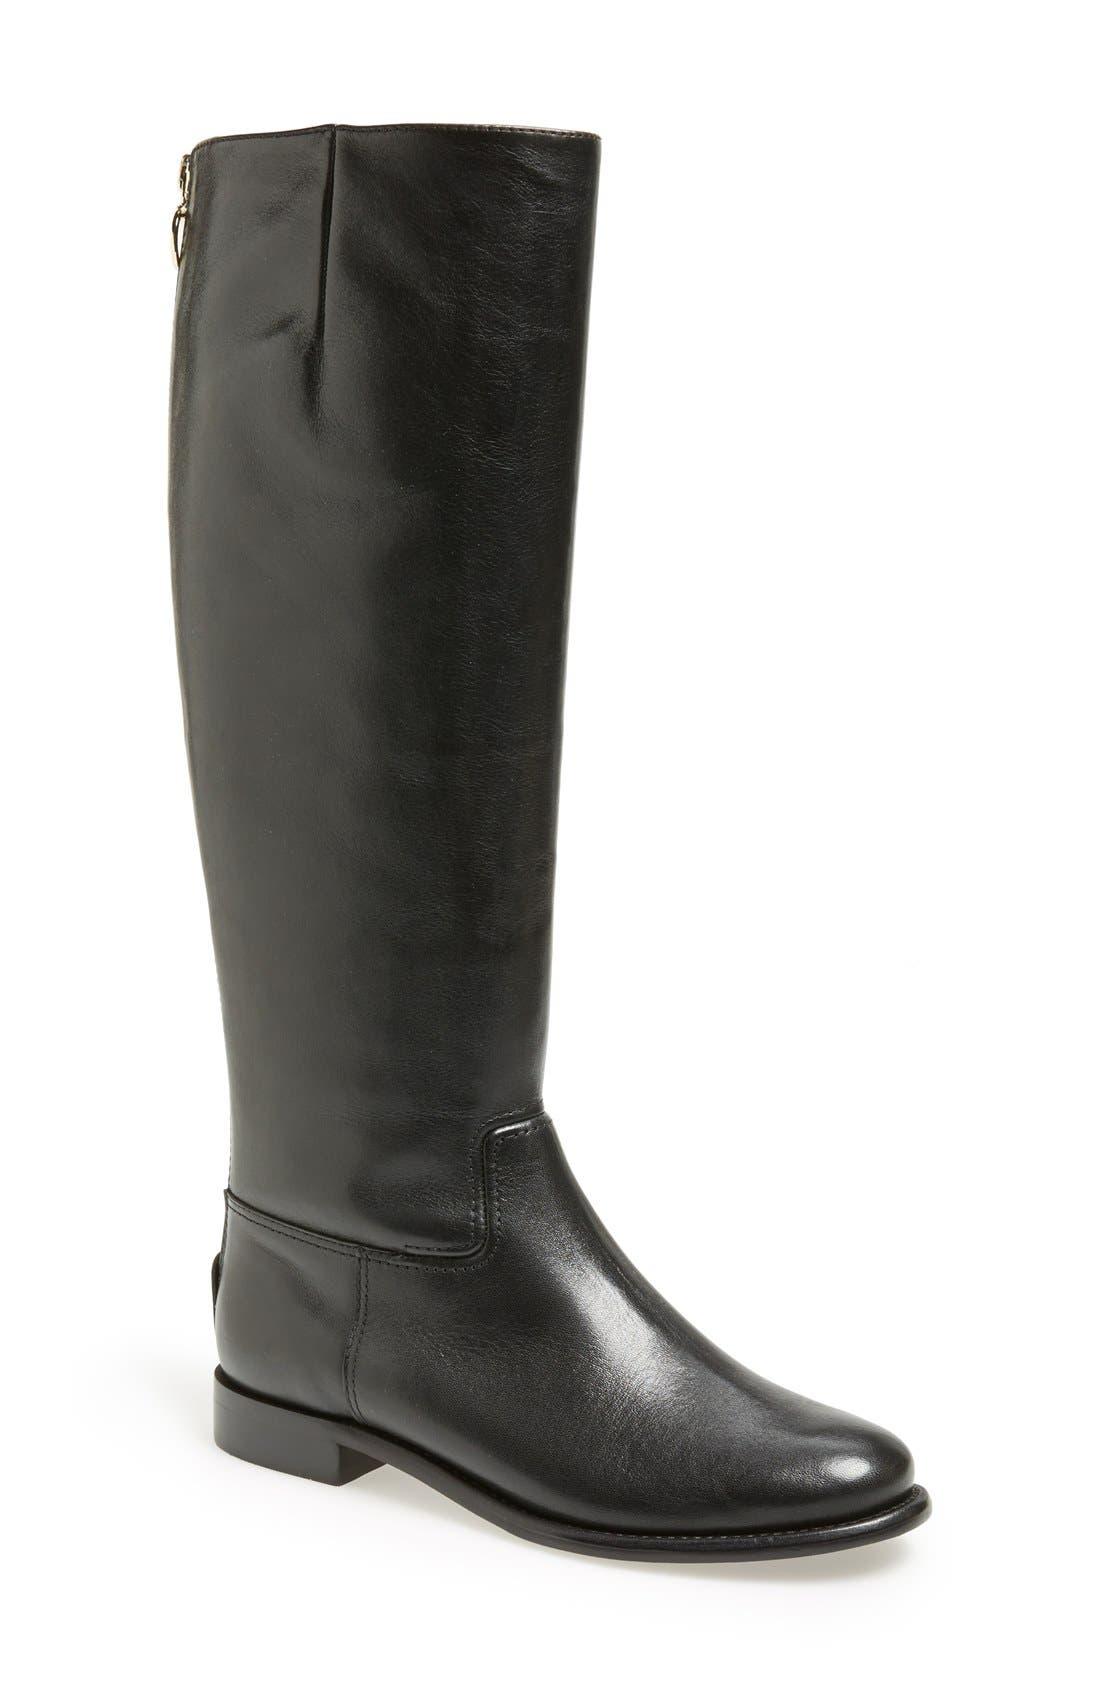 Alternate Image 1 Selected - Diane von Furstenberg 'Ranger' Tall Boot (Women)